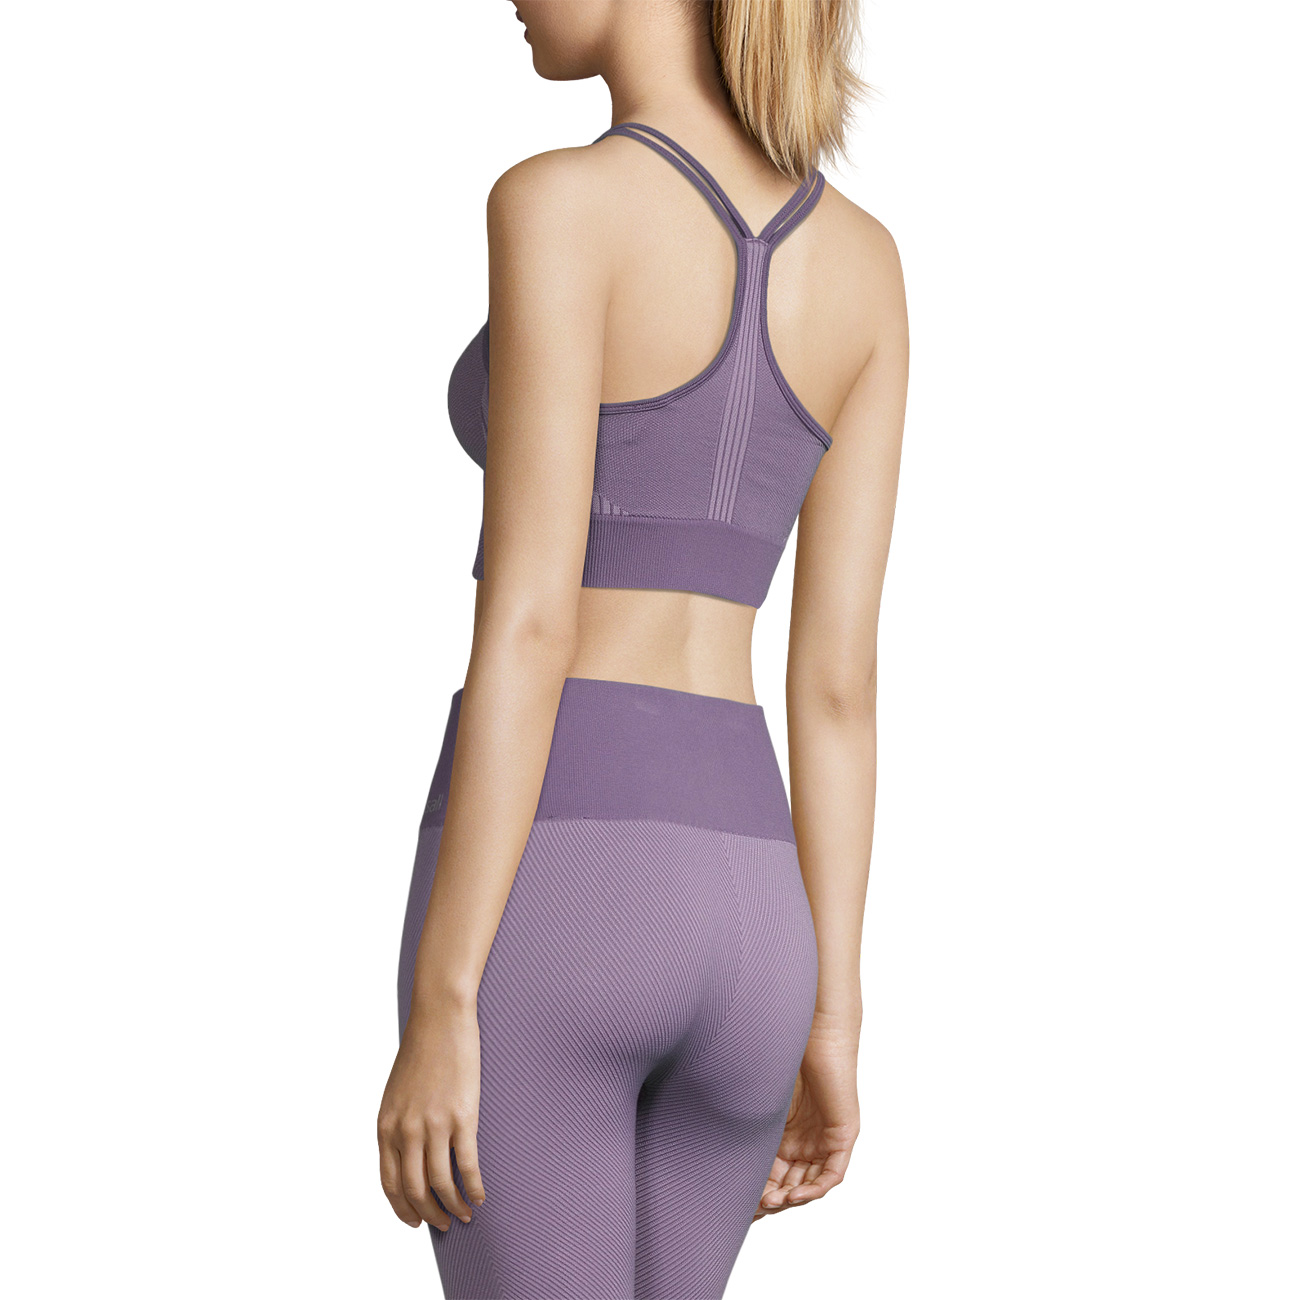 on sale 5586d f71f6 Sport Seamless Women s Casall Lavender By Spa Bra s Sports Top xzqwzrYA